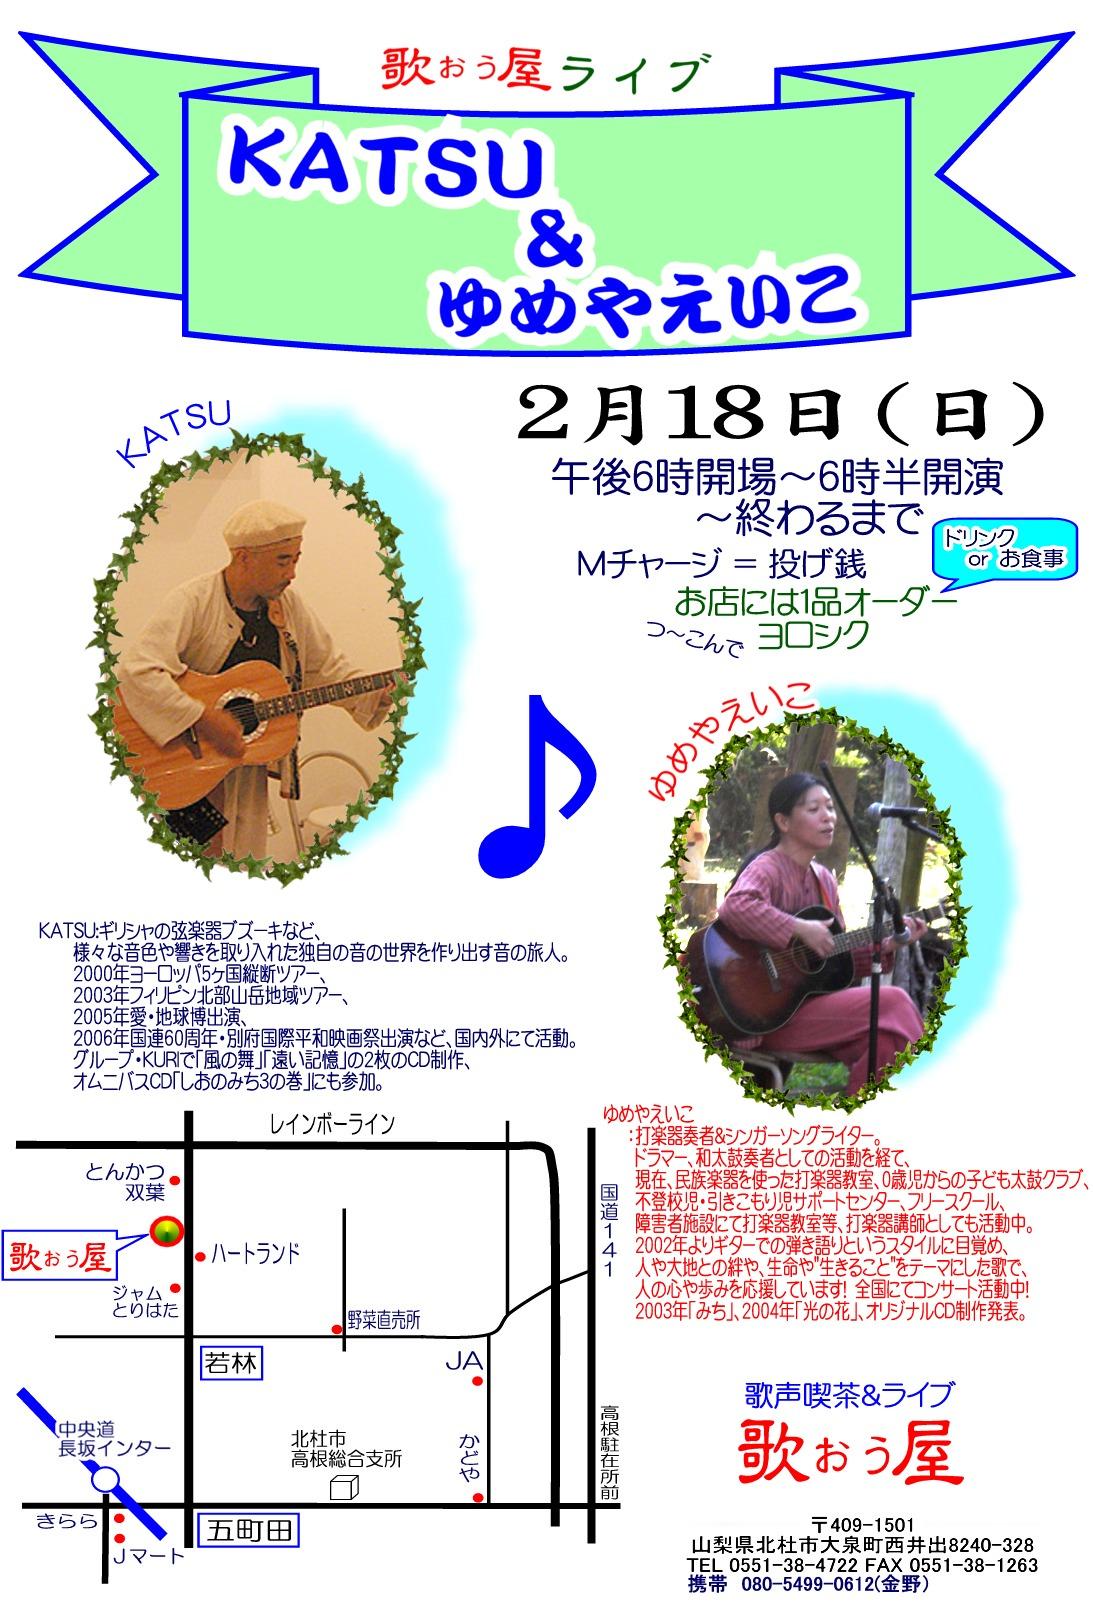 KATSU & ゆめやえいこライブ_d0101556_1402055.jpg